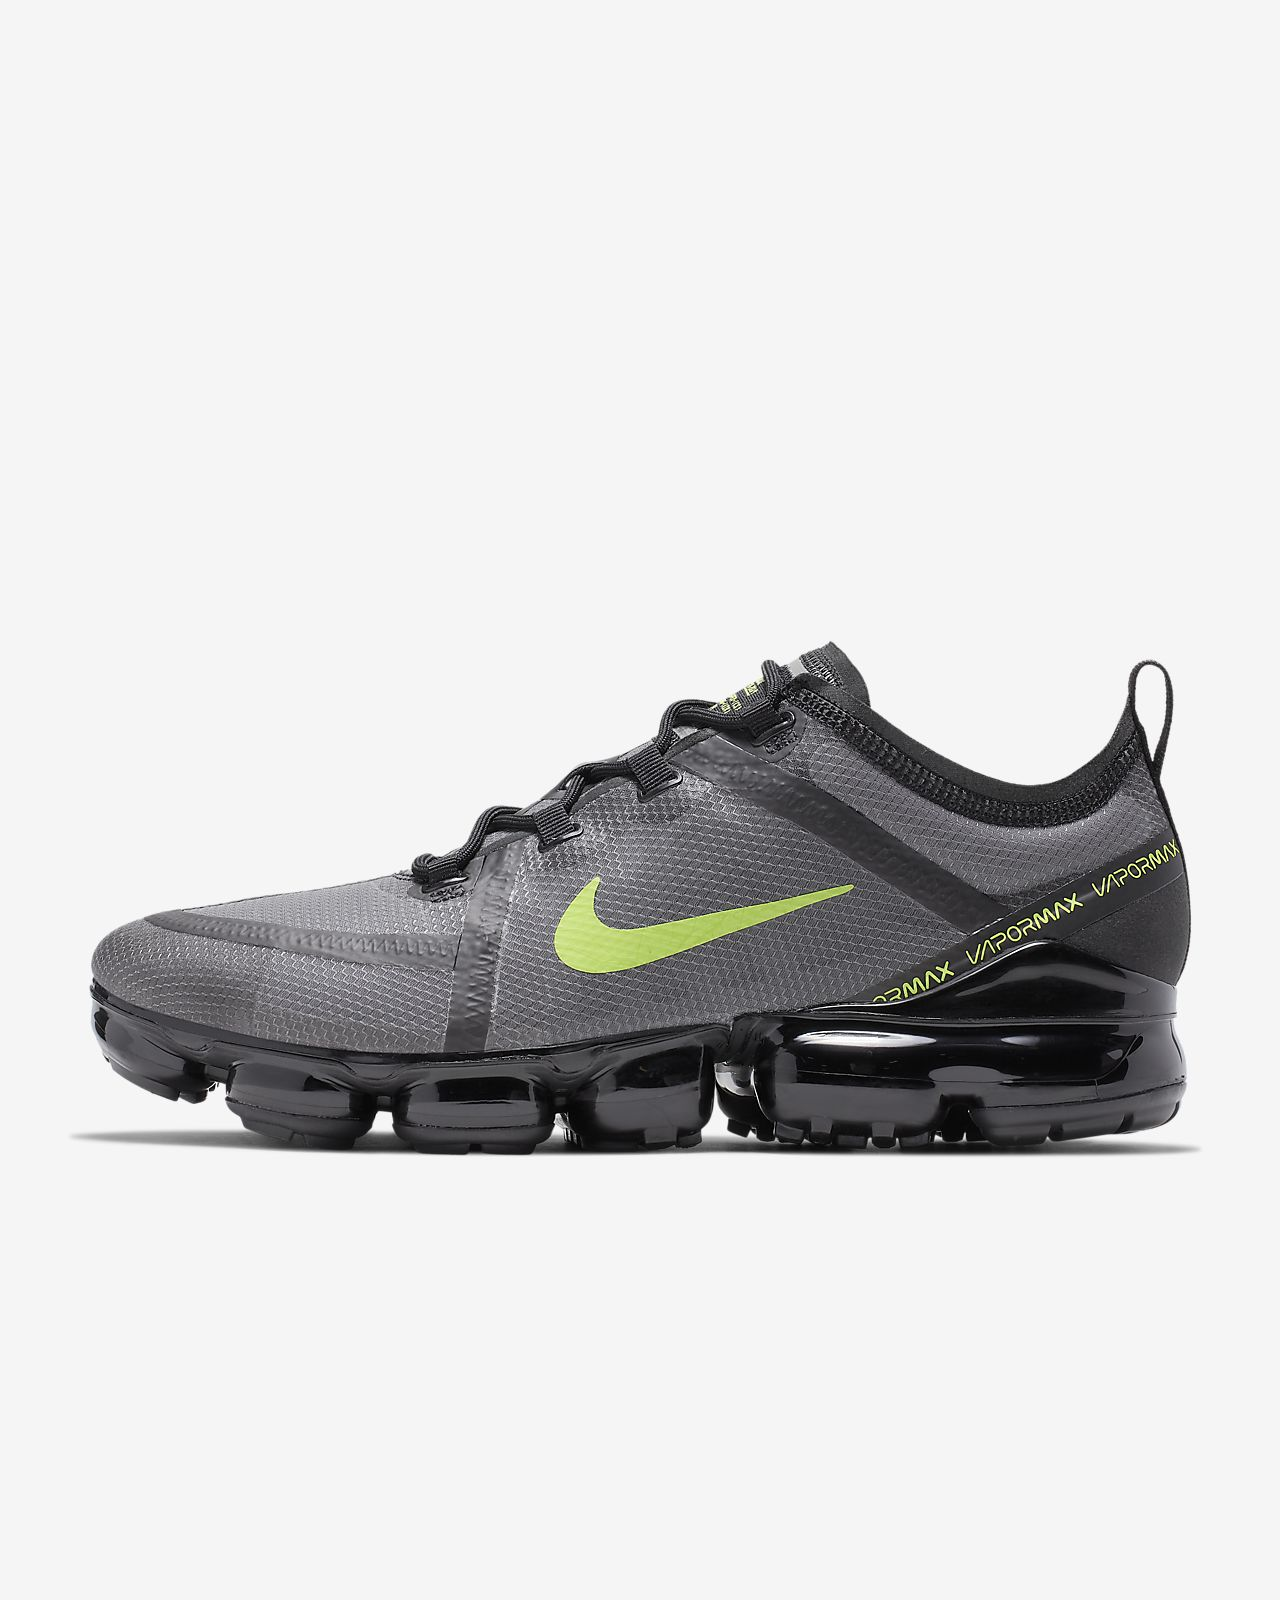 buy online 025b9 5e7e9 Chaussure Nike Air VaporMax 2019 pour Homme. Nike.com FR